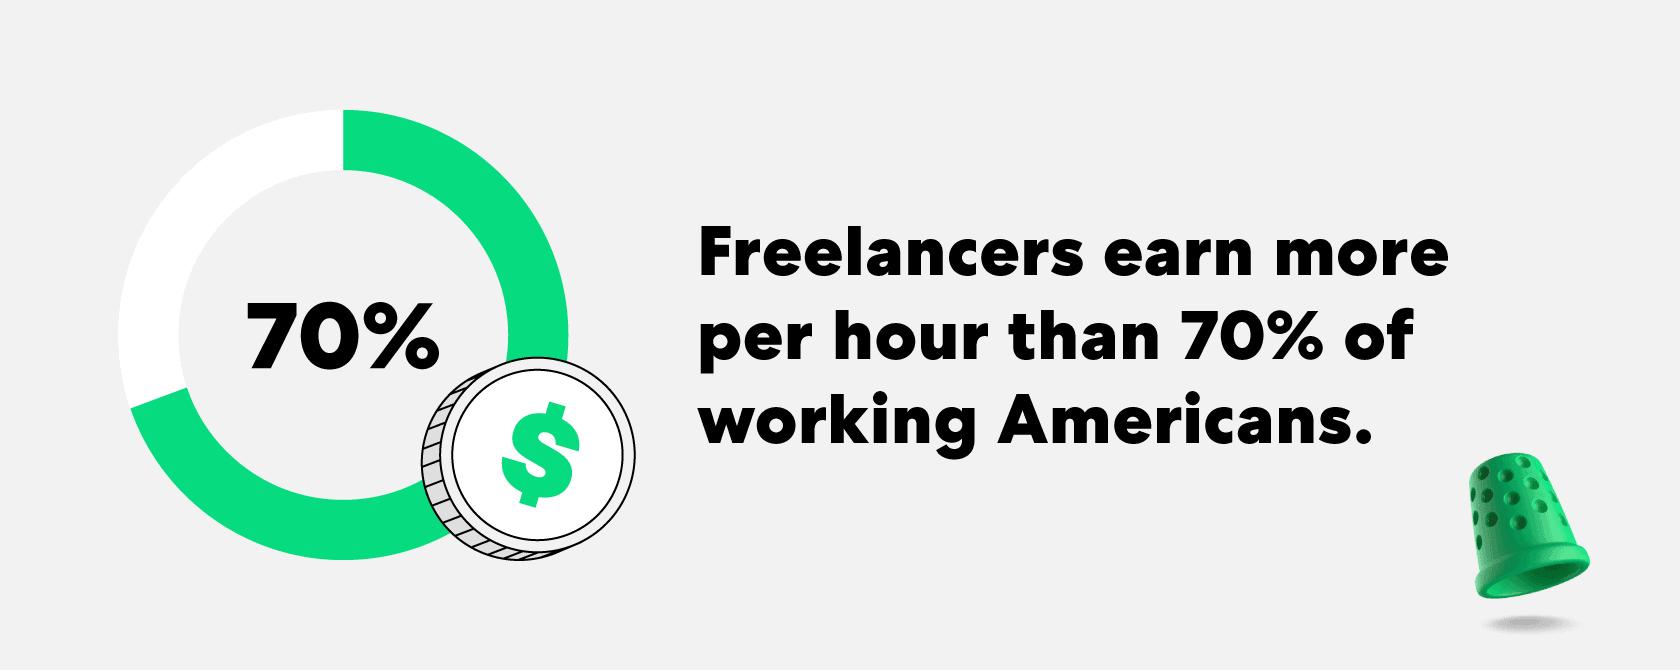 70-freelancers-earn-more